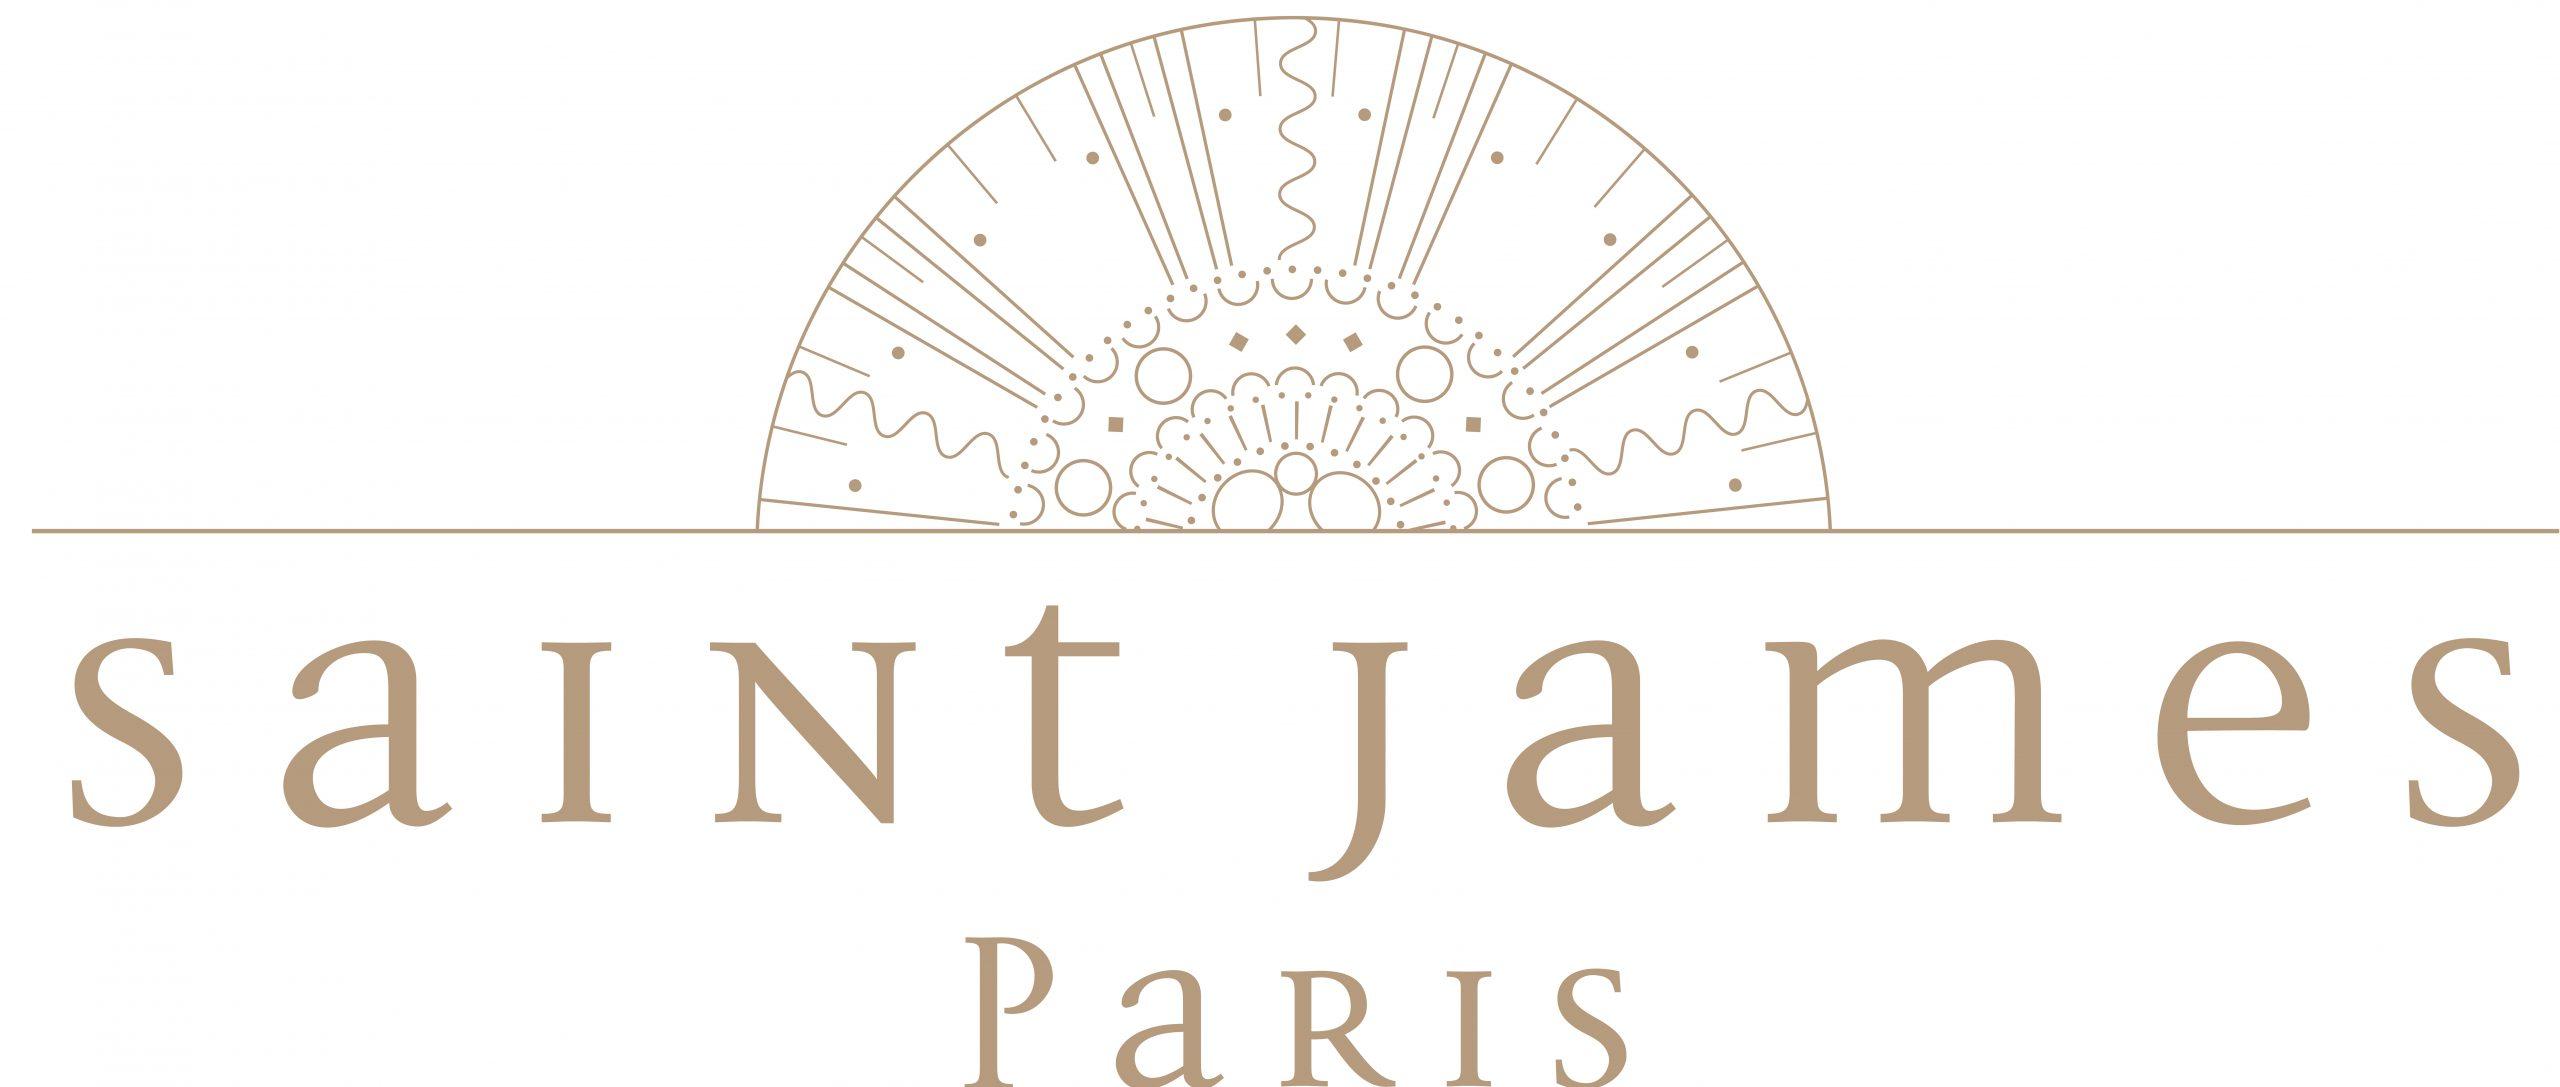 SAINT JAMES PARIS LOGO_LAITON copie